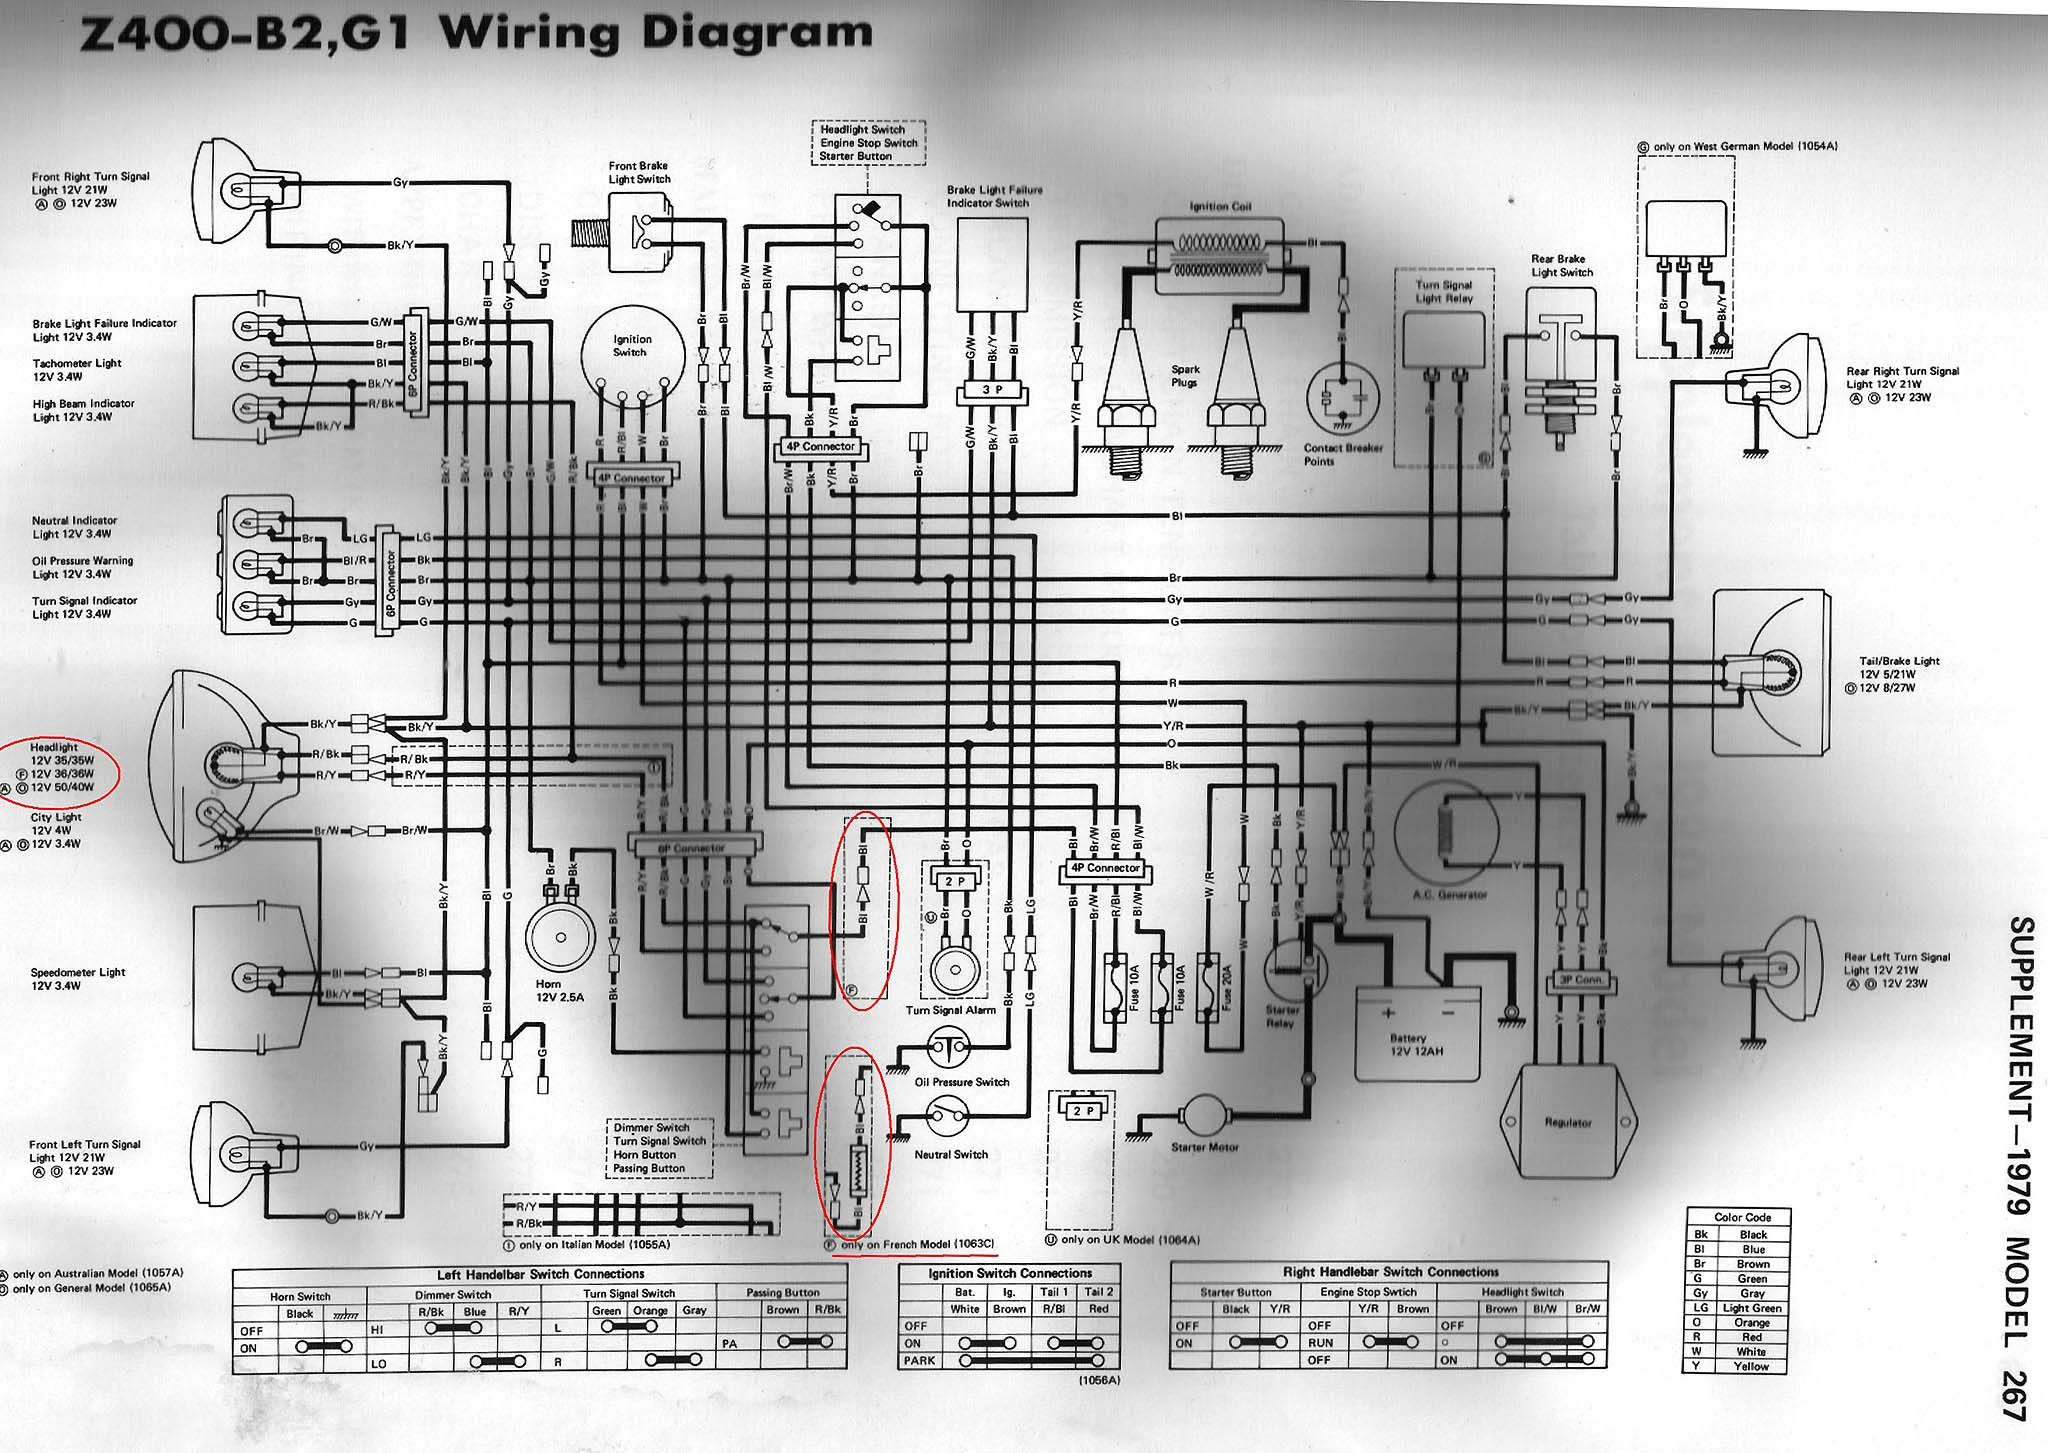 1979 400,B2, G1.jpg (2048×1453) | Diagram, Wire, Model